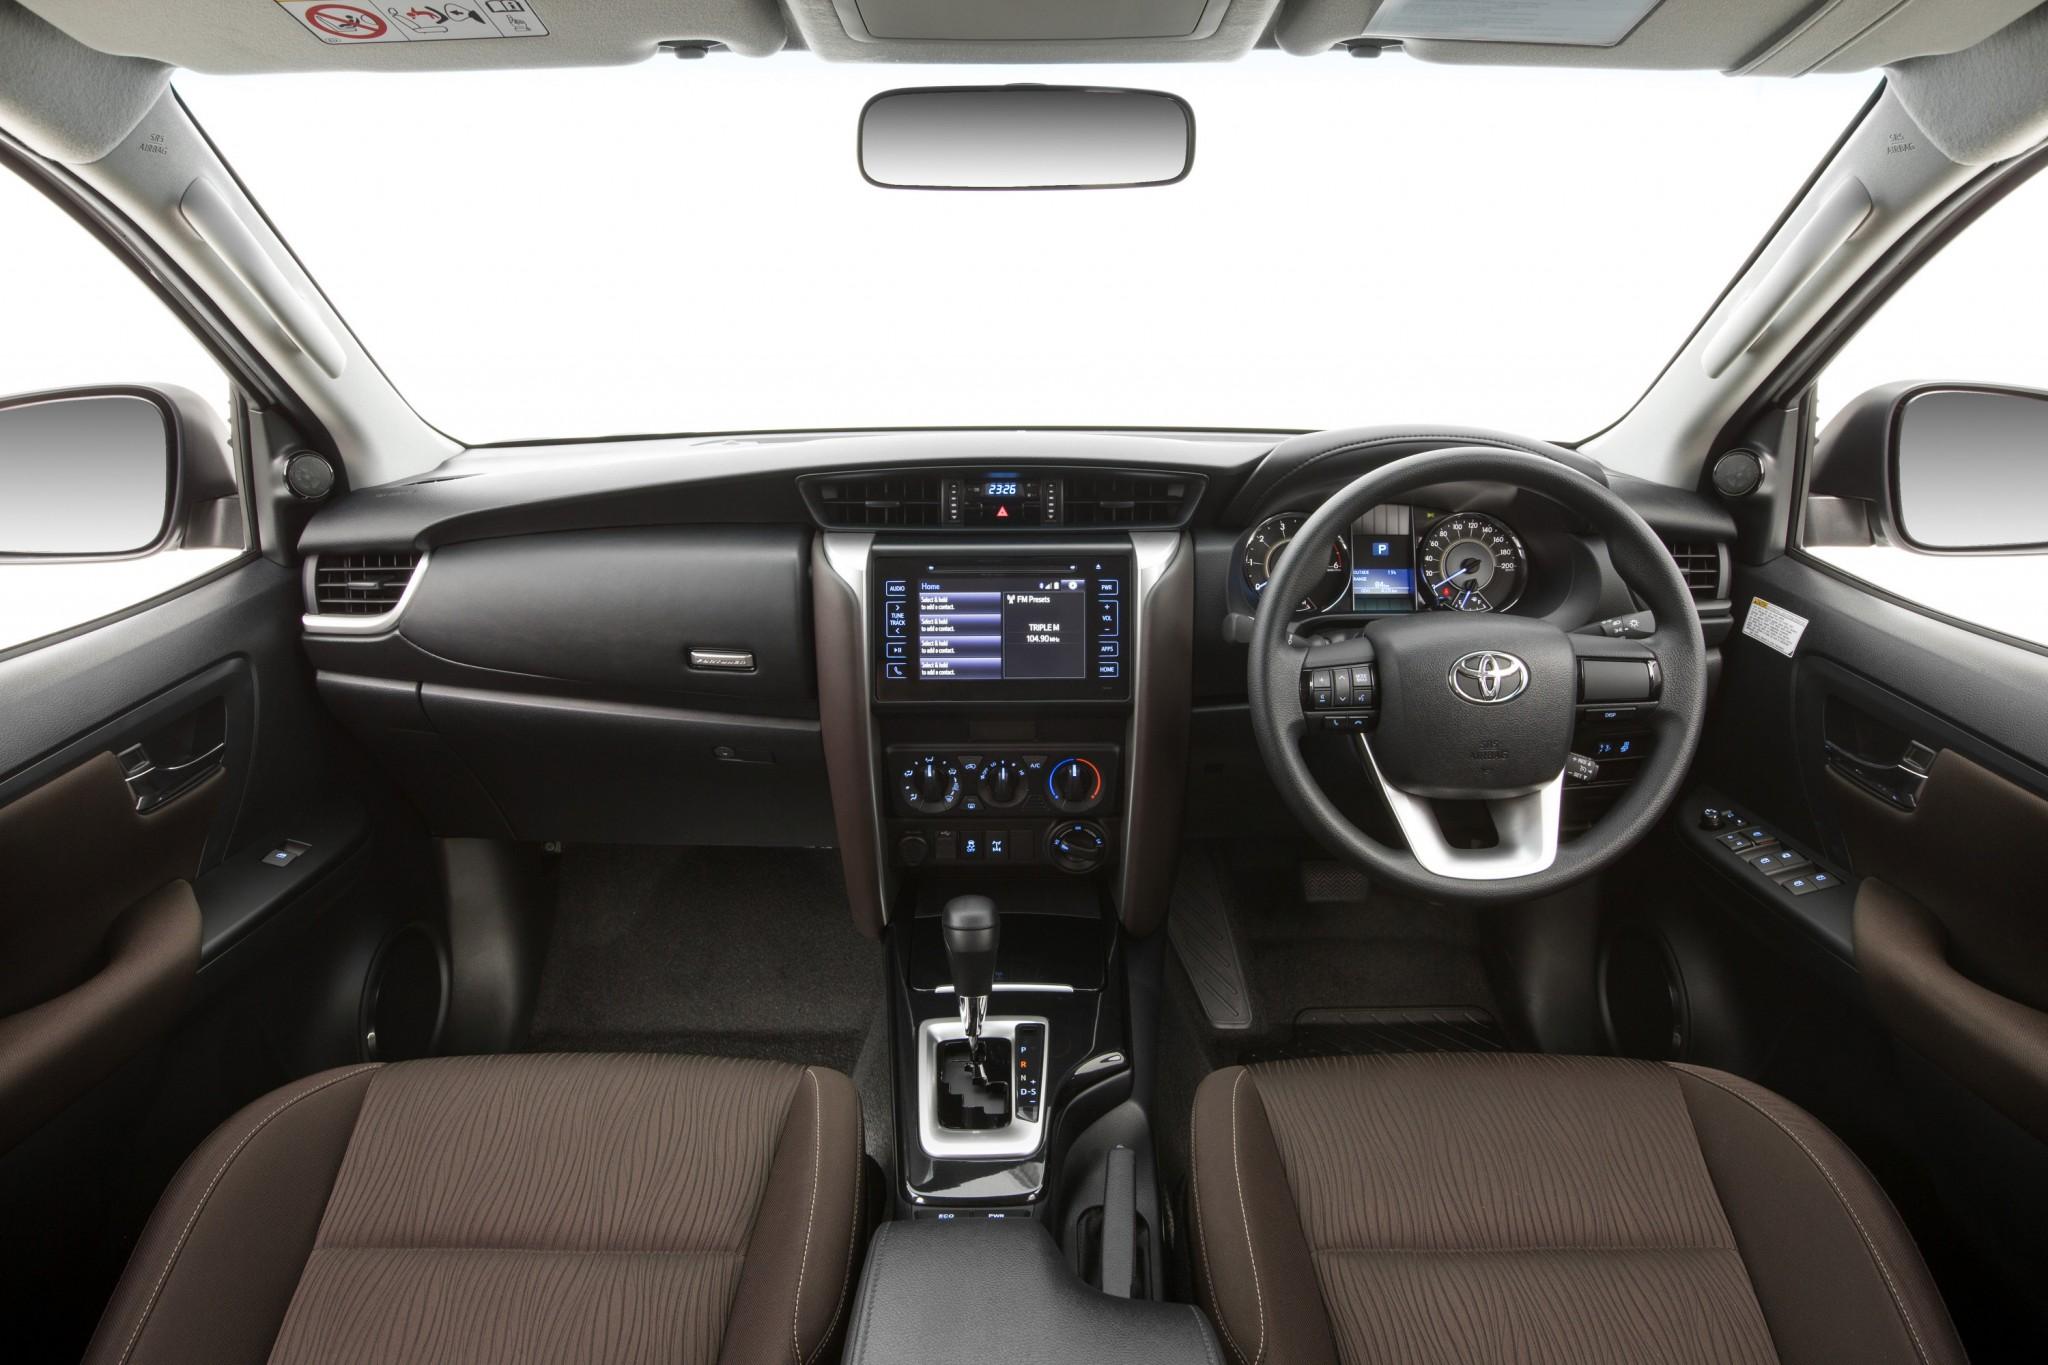 2016 Toyota Fortuner interior revealed | Practical Motoring